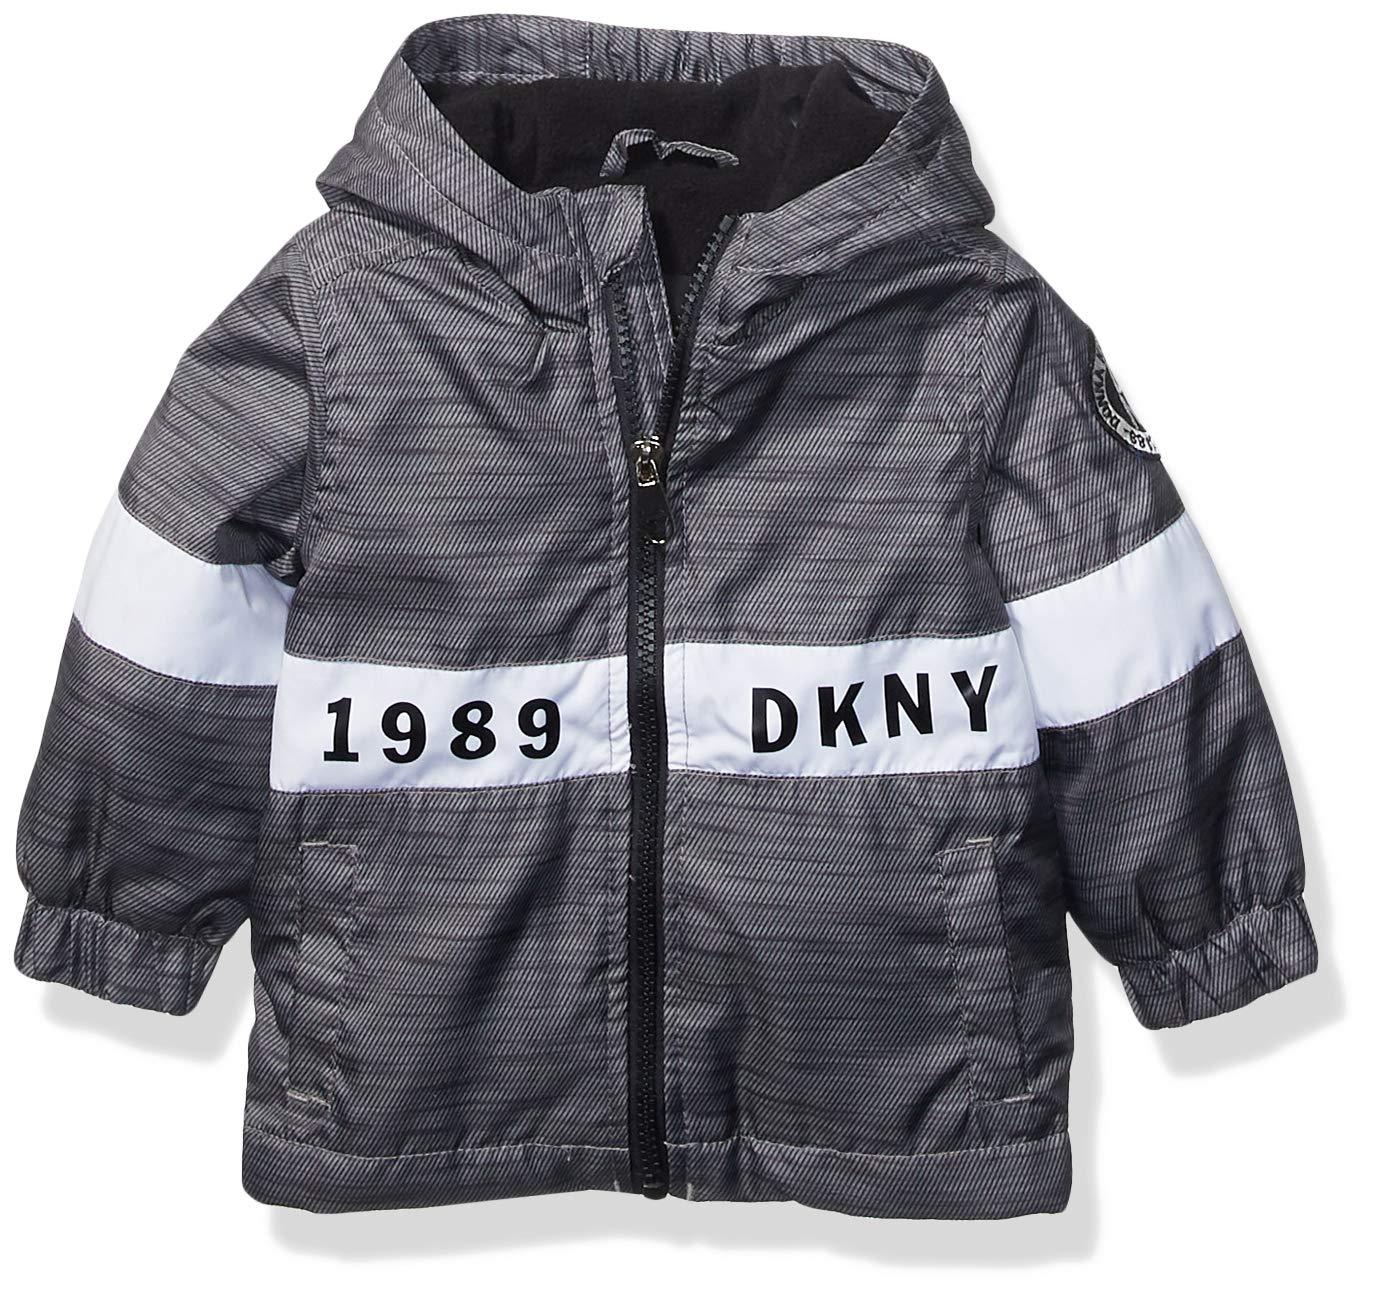 DKNY Baby Boys Fashion Outerwear Jacket, Since 1989 Heather Gray Print, 18M by DKNY